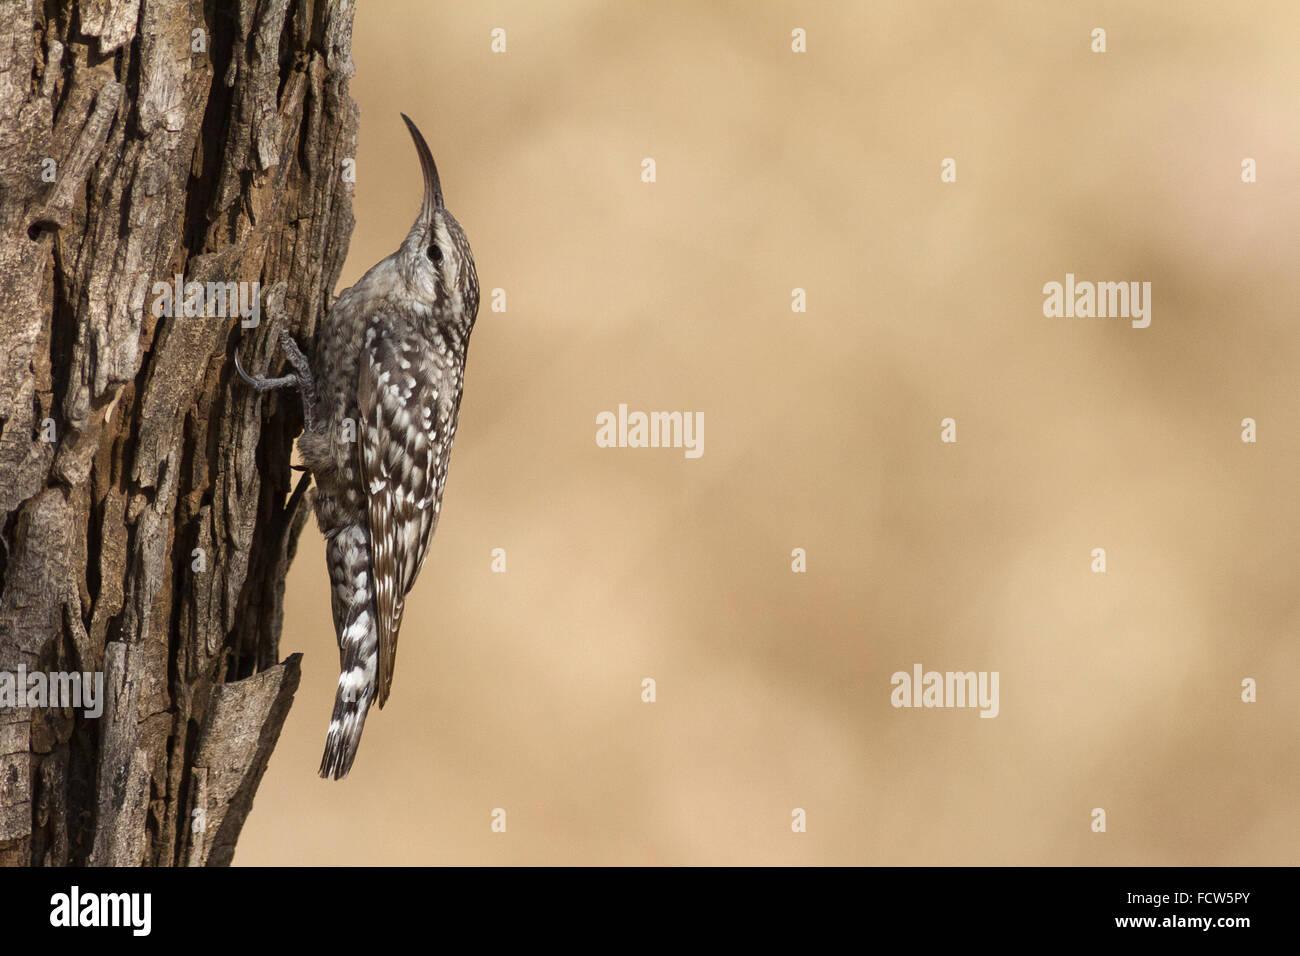 Indian spotted creeper (Salpornis spilonotus) at Dahod, Gujarat, India - Stock Image